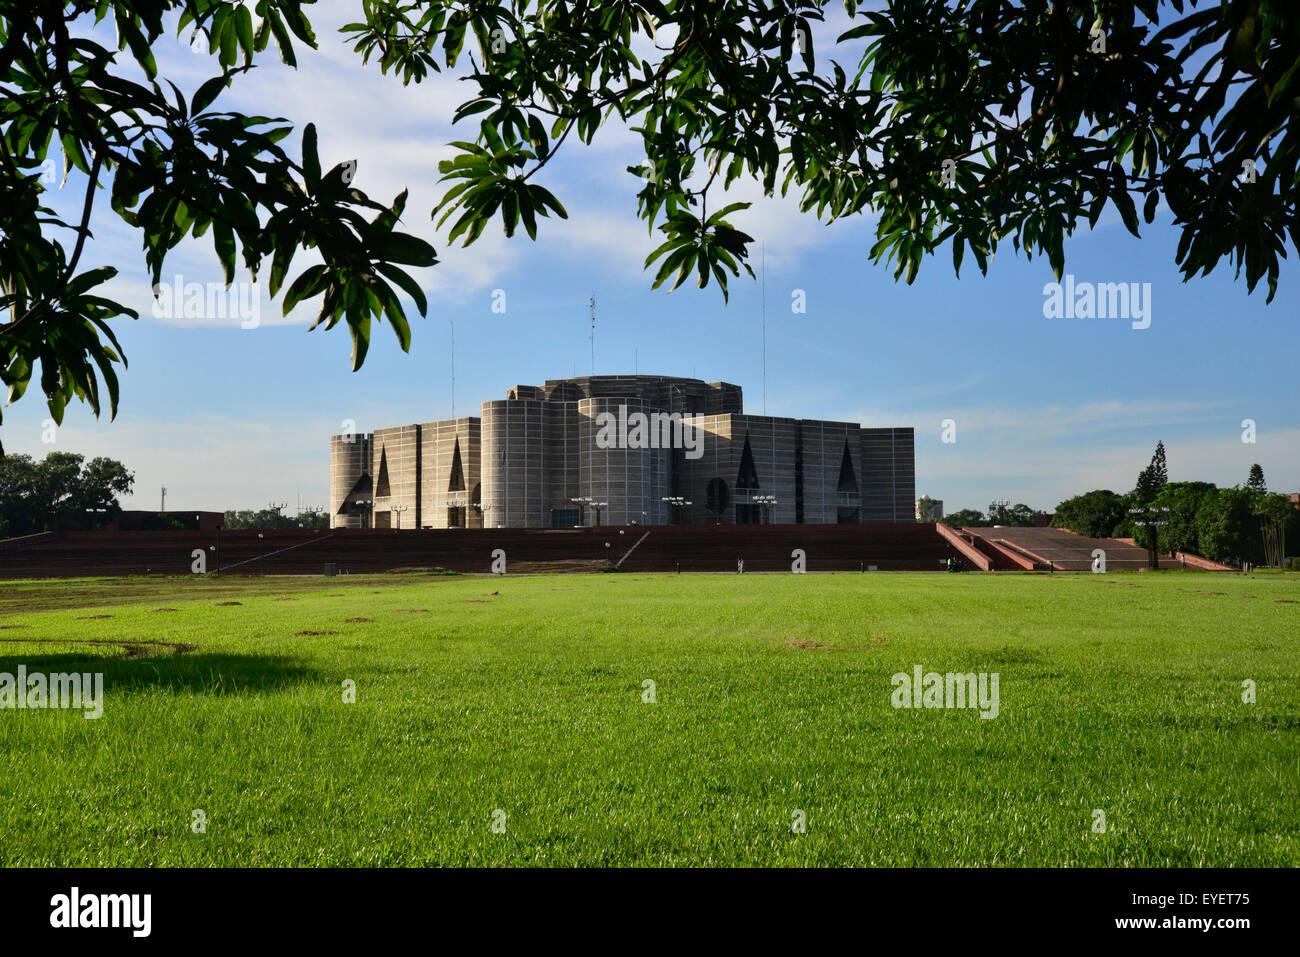 Dhaka bangladesh 28th july 2015 the national for Bangladesh house picture